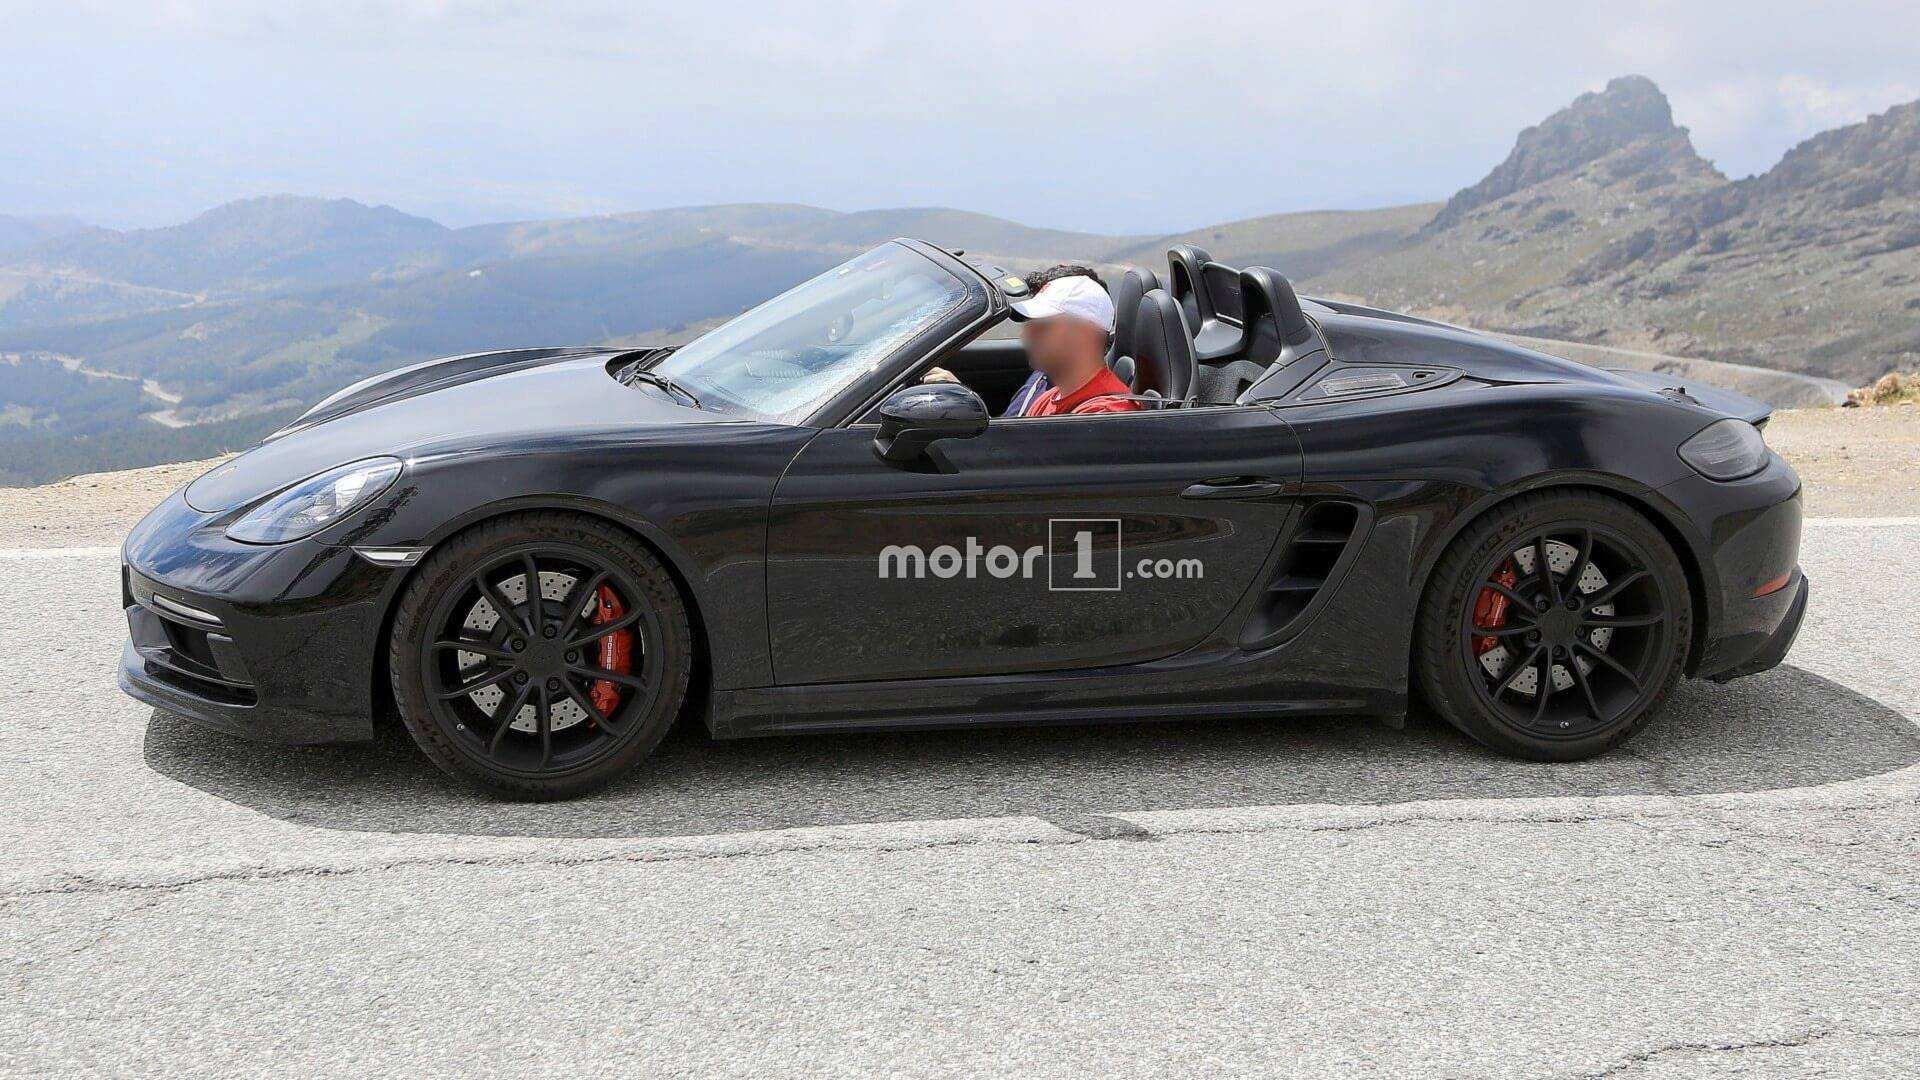 56 Concept of 2019 Porsche 718 Research New by 2019 Porsche 718